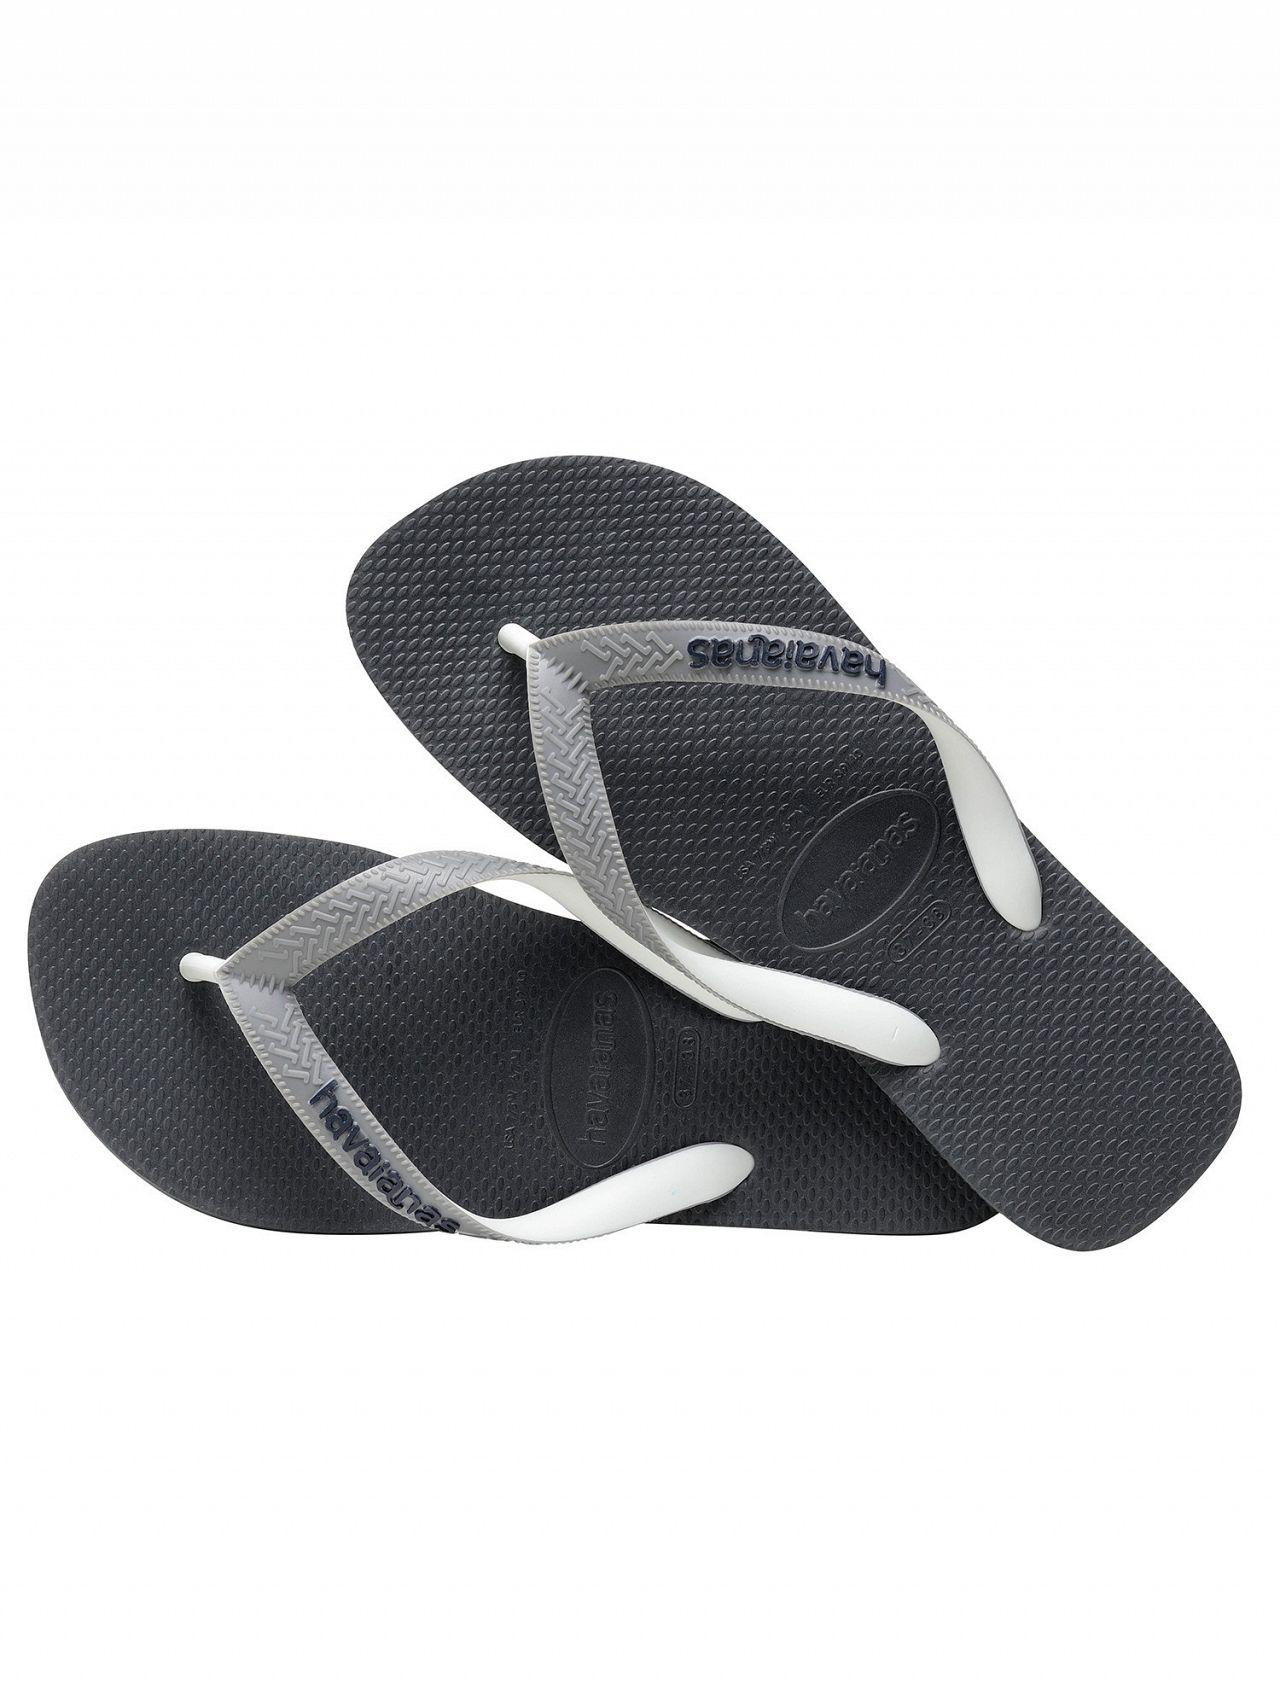 d0703dfd1 Havaianas Graphite Grey Top Mix Flip Flops